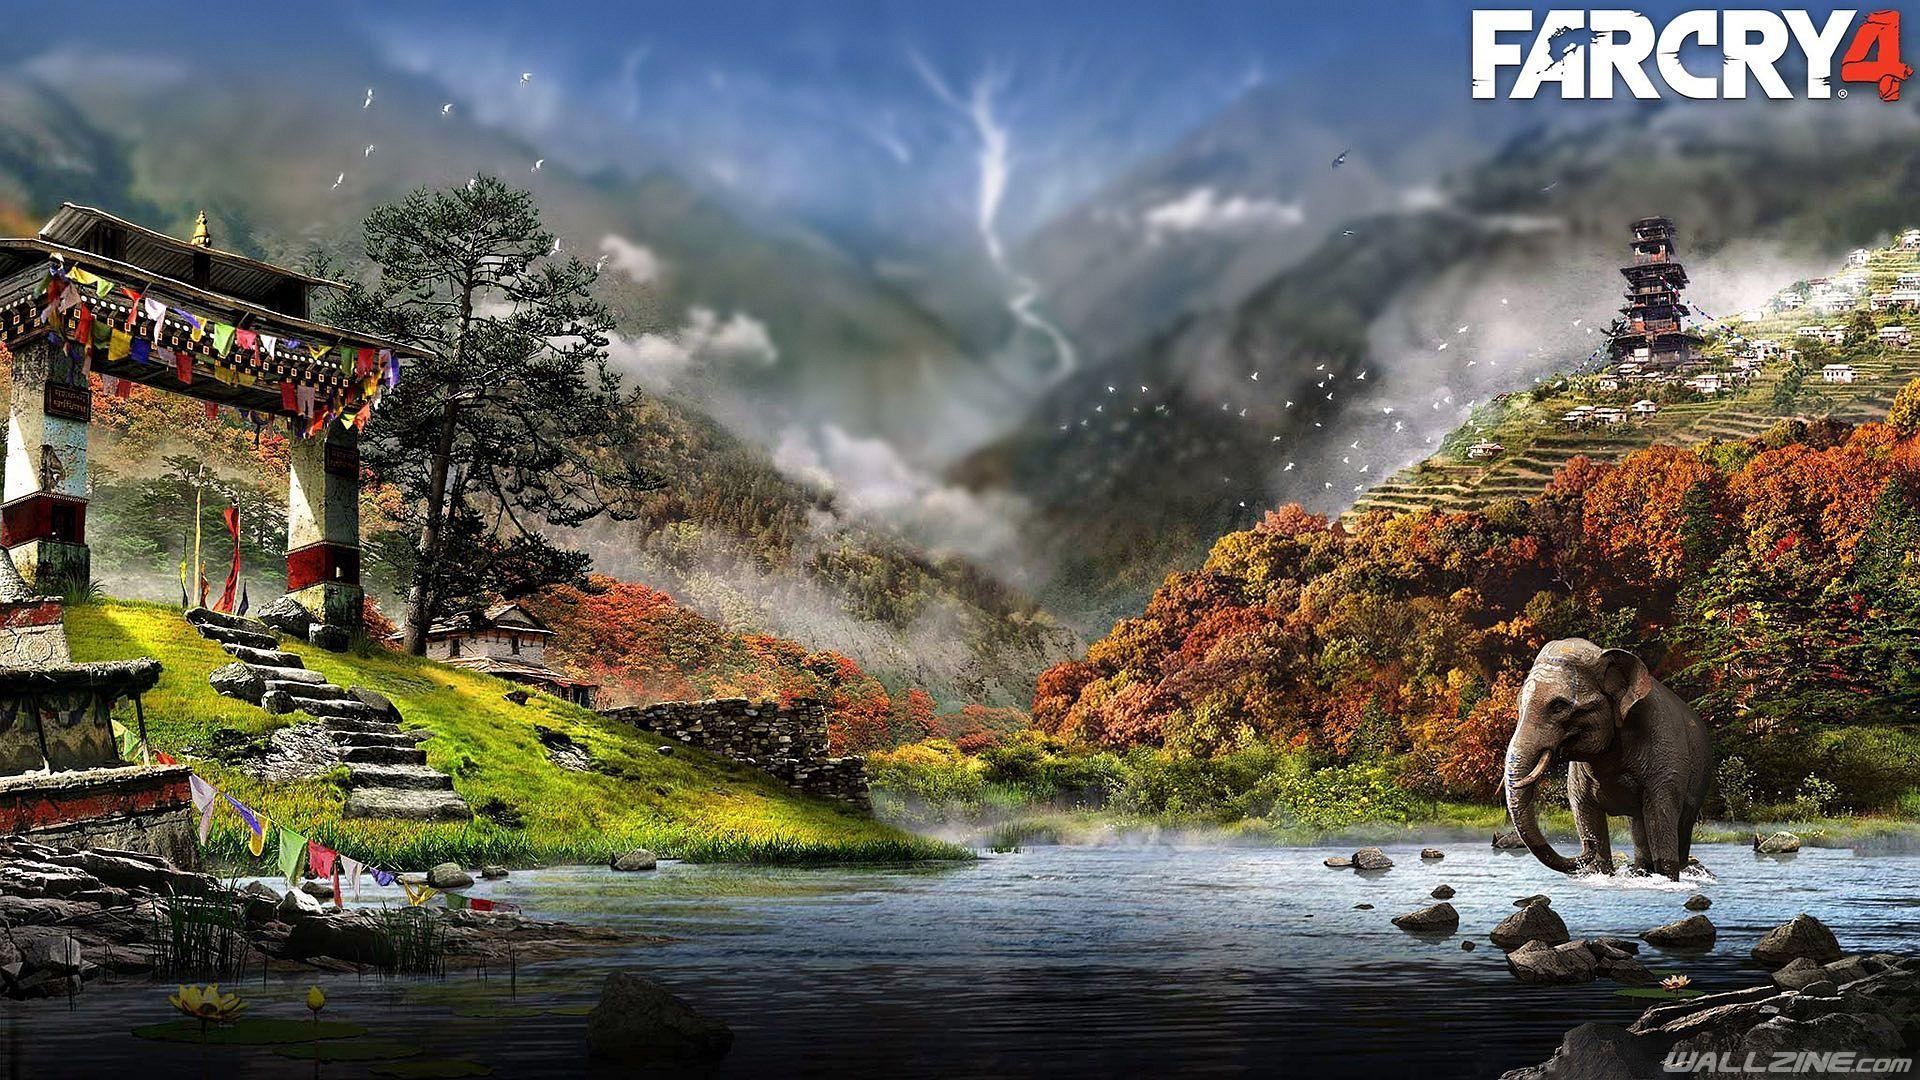 Far Cry 4 Wallpaper 4k Landscape Wallpaper Far Cry 4 Landscape